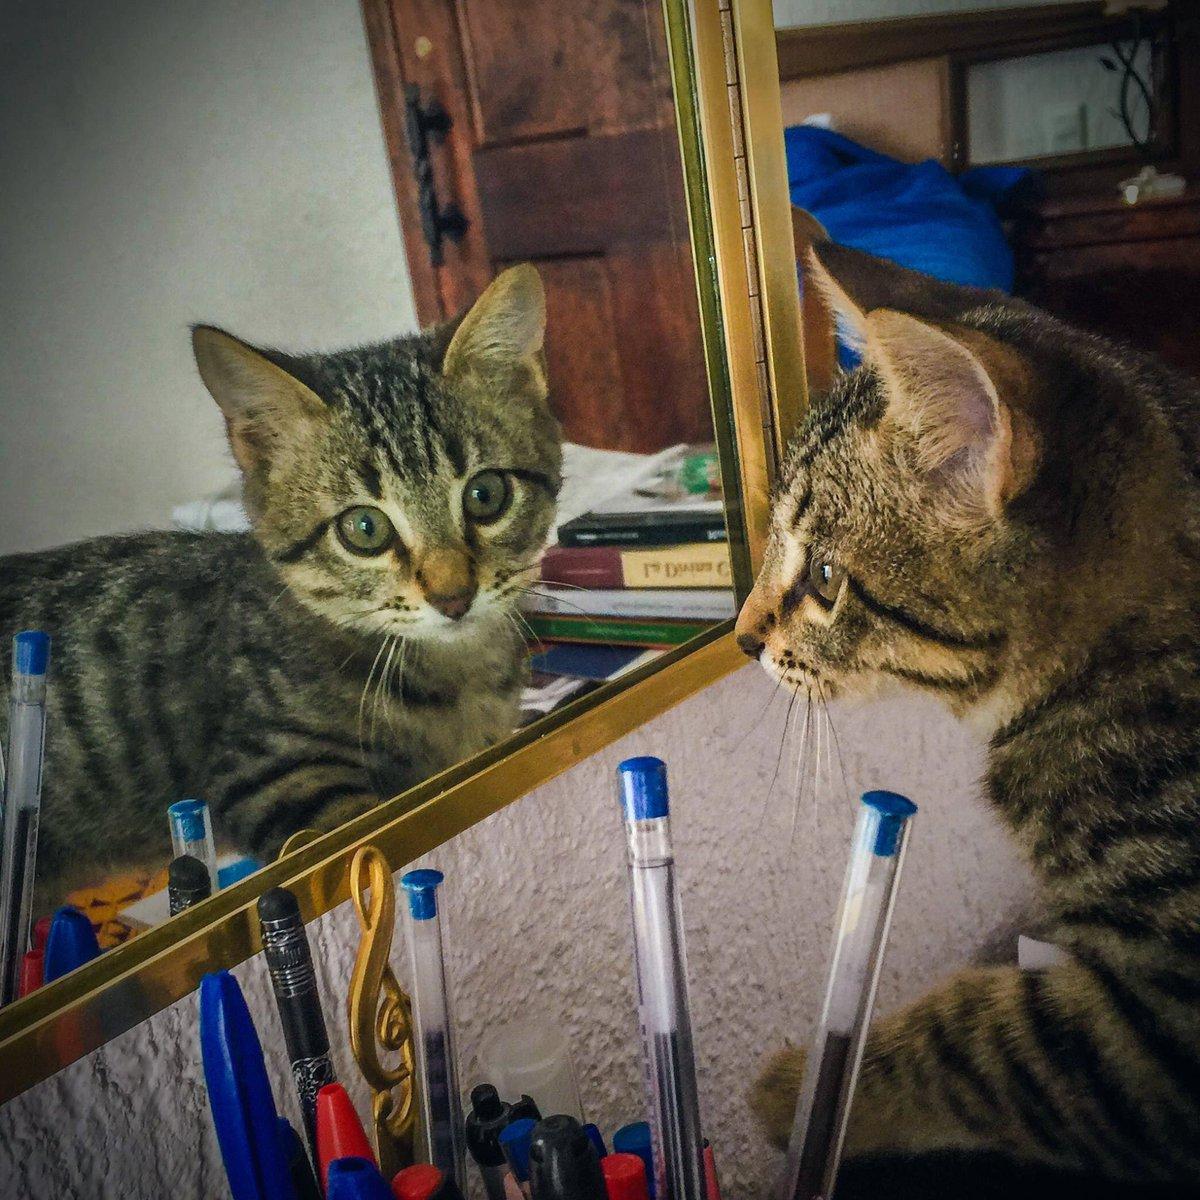 Paquito bebé en 2015. Ahi tenia como 3 meses. Feliz caturday!😽❤️ #Caturday #cats